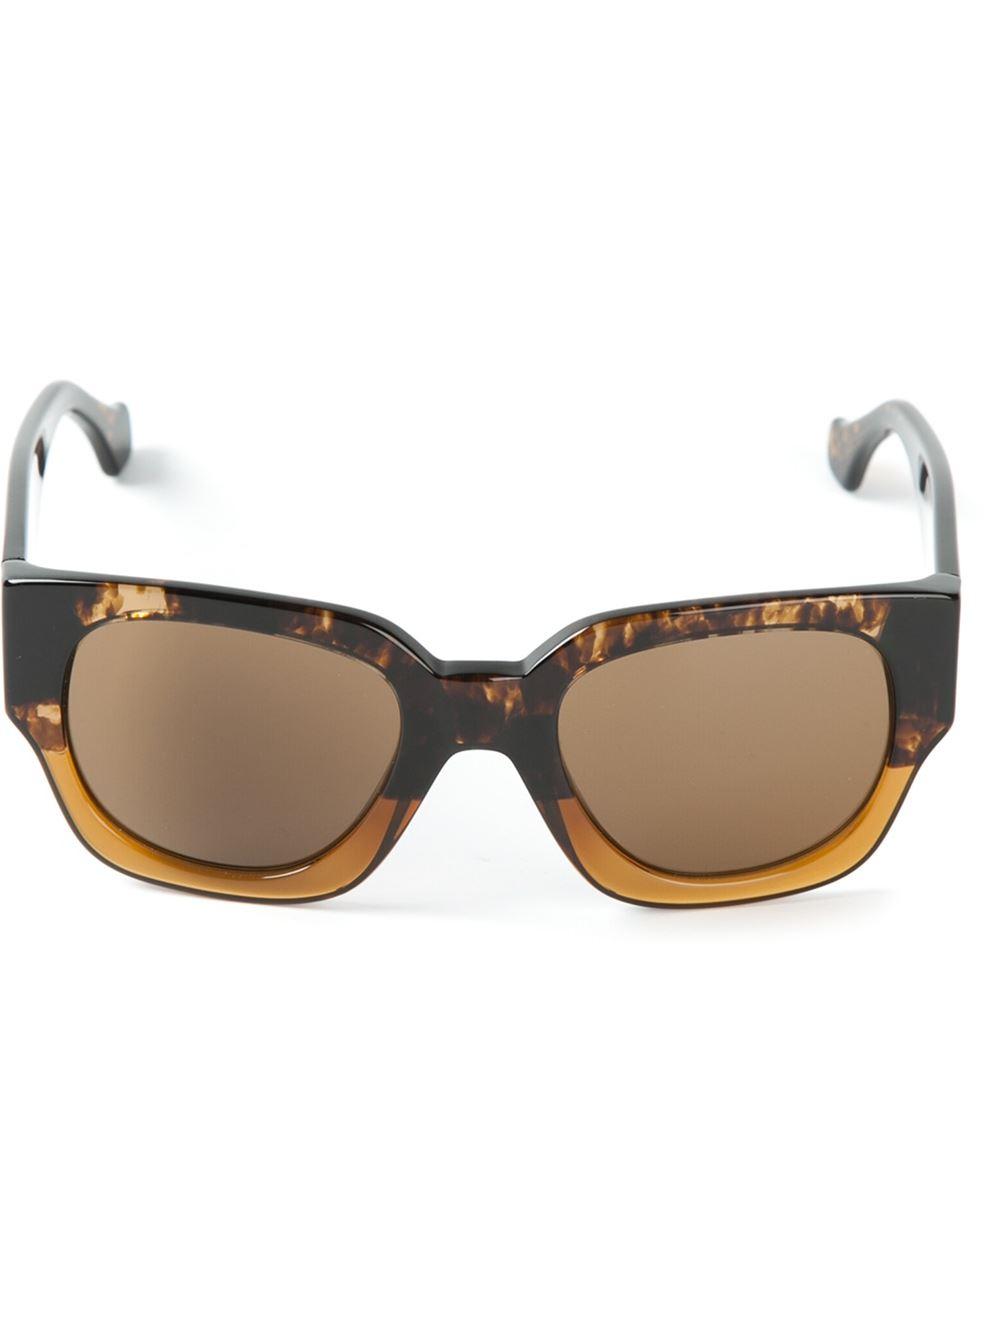 328a5ab073b Lyst - Balenciaga Square Frame Sunglasses in Brown for Men